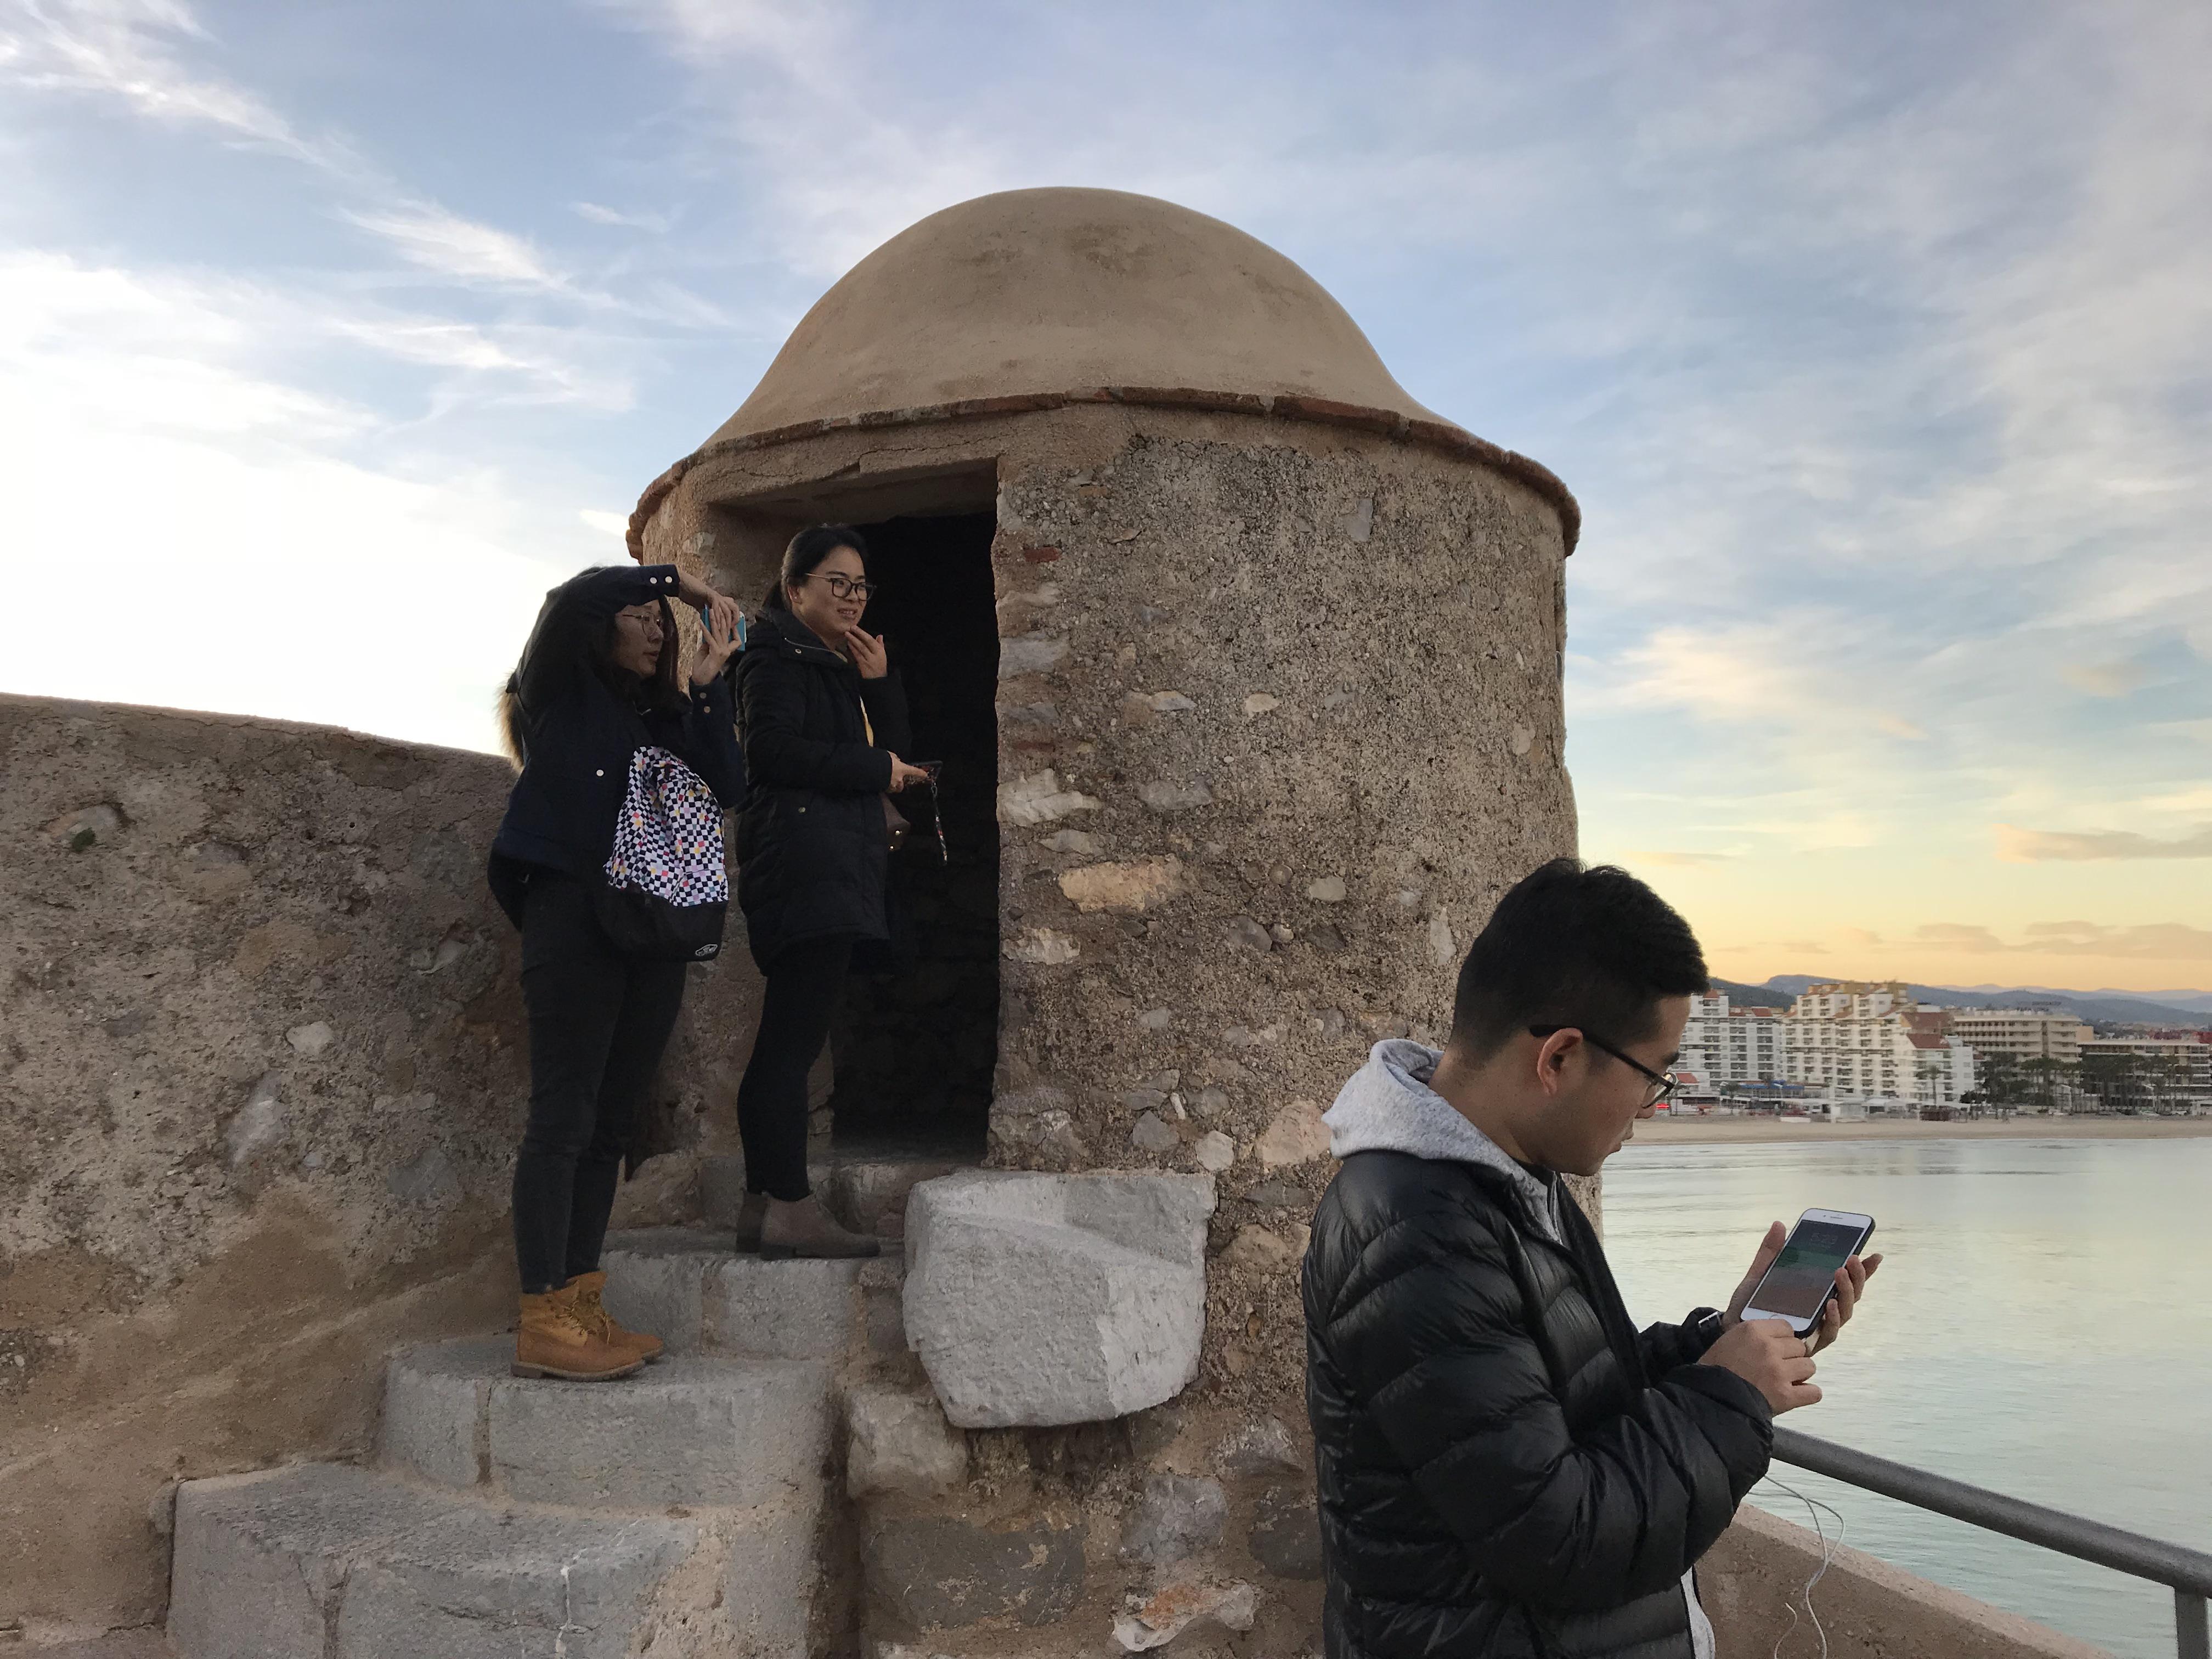 Turistas chinos en Peñíscola usando sus móviles